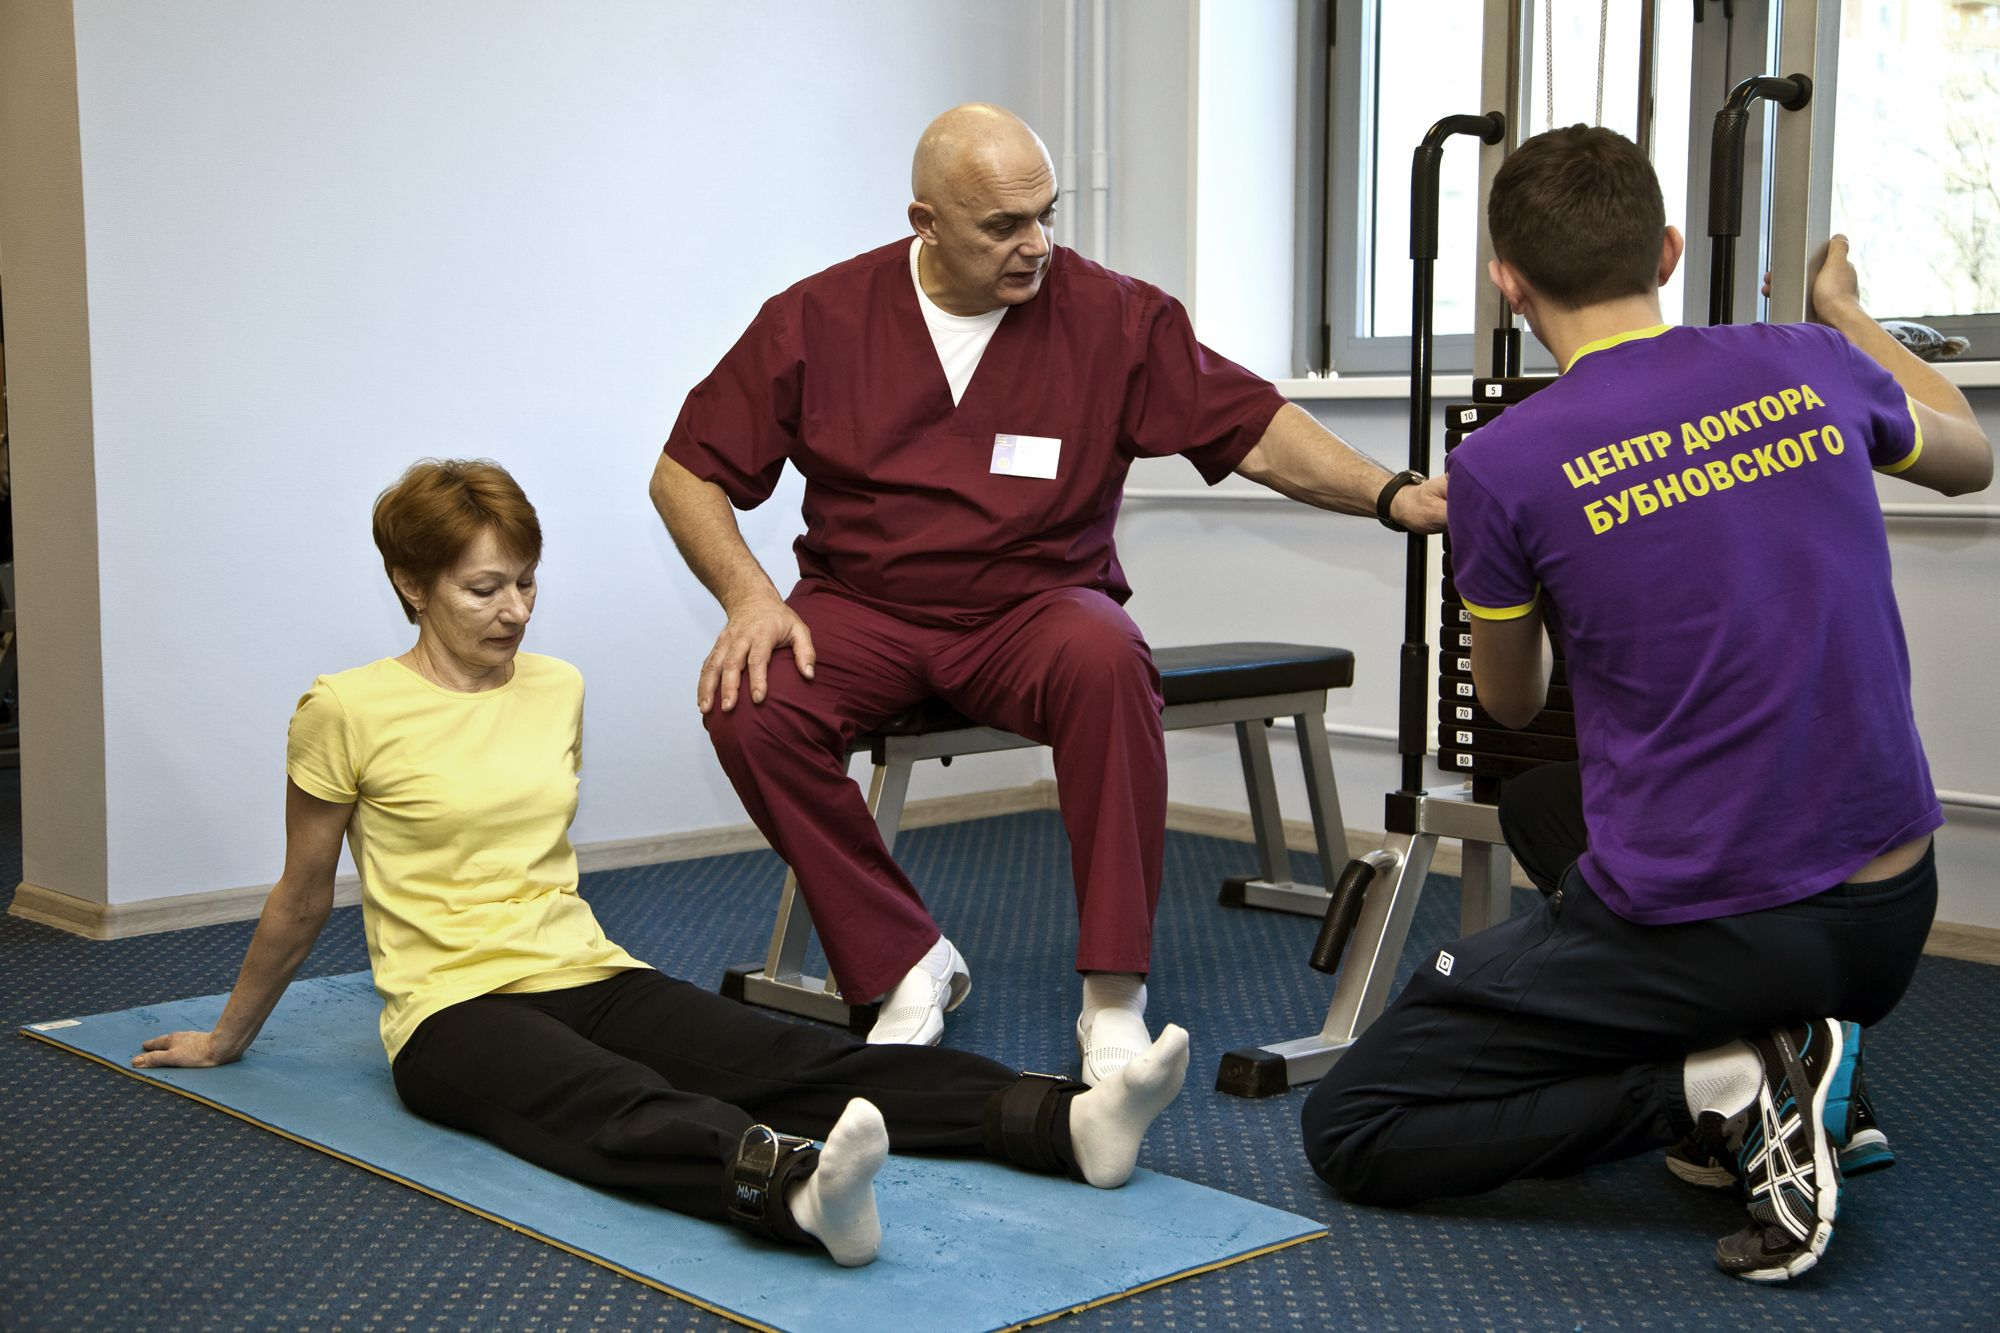 Мази и кремы для лечения артроза коленного сустава